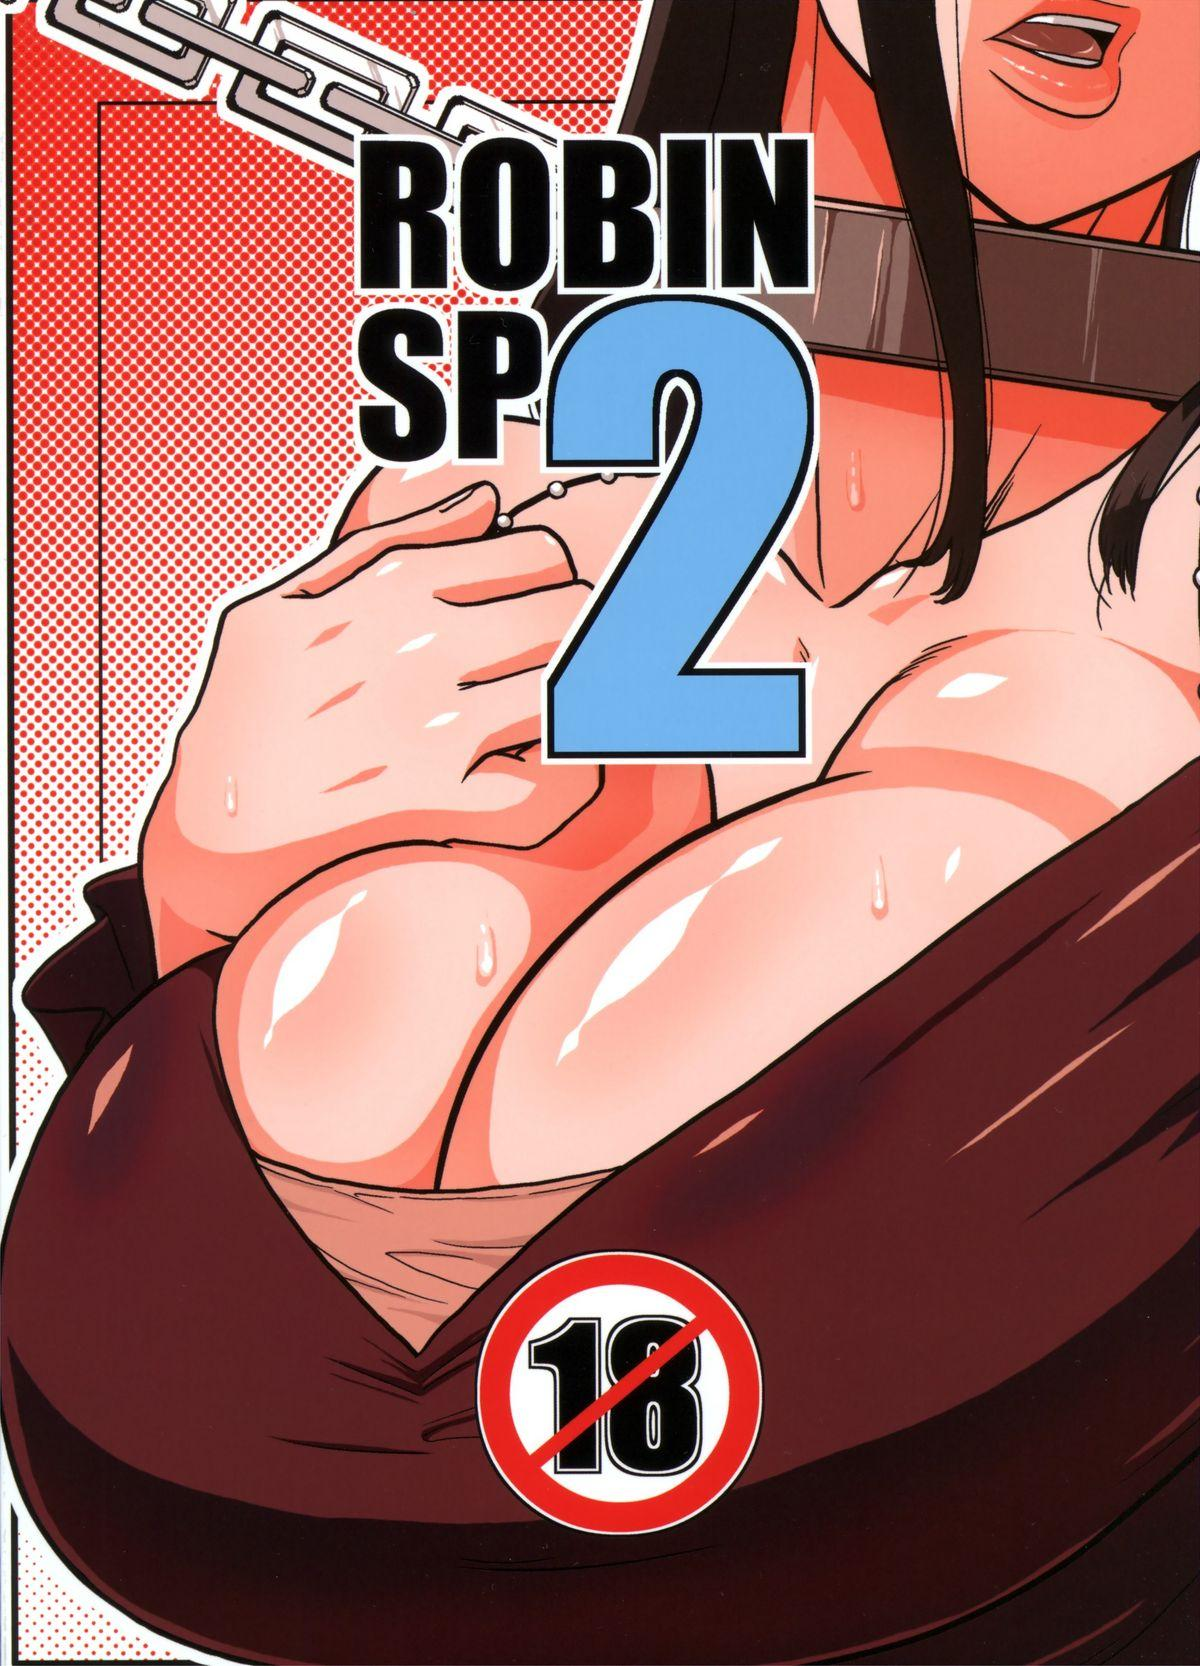 ROBIN SP 2 25